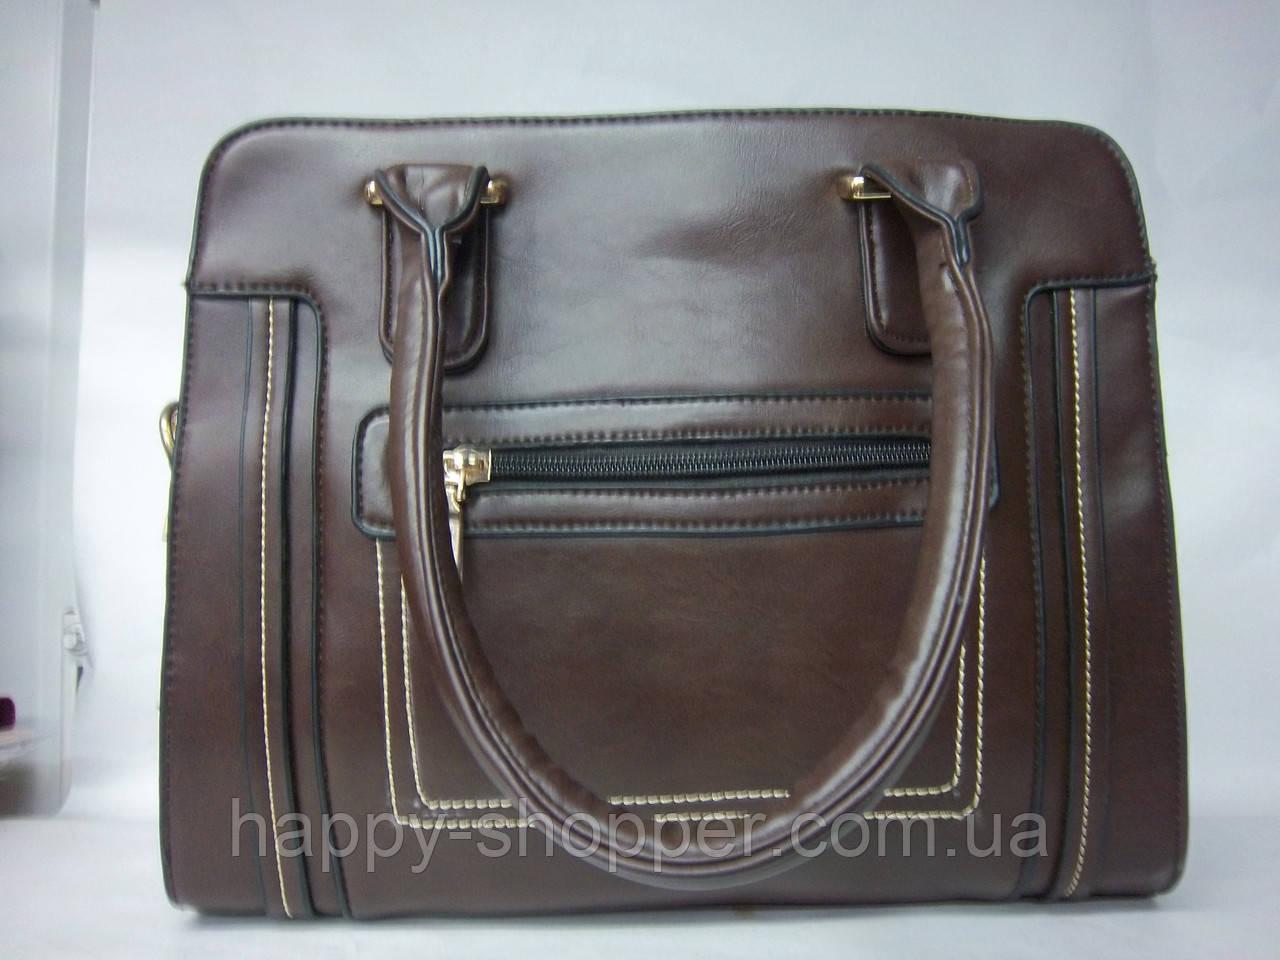 Сумка женская Boutique leather AL-64